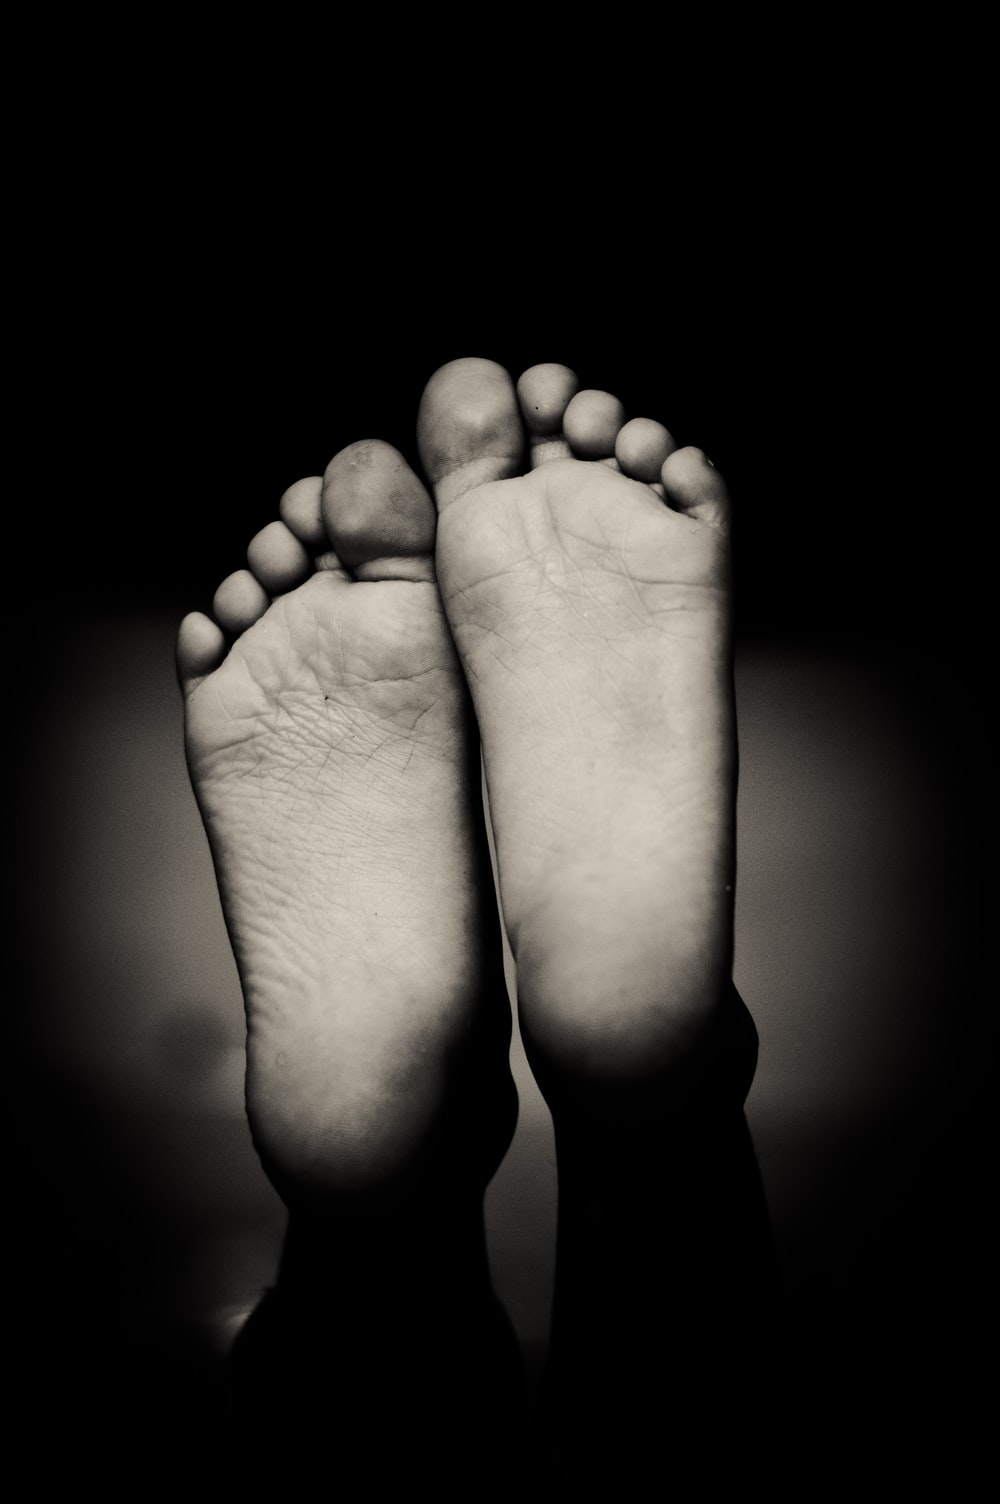 grayscale photo of human feet